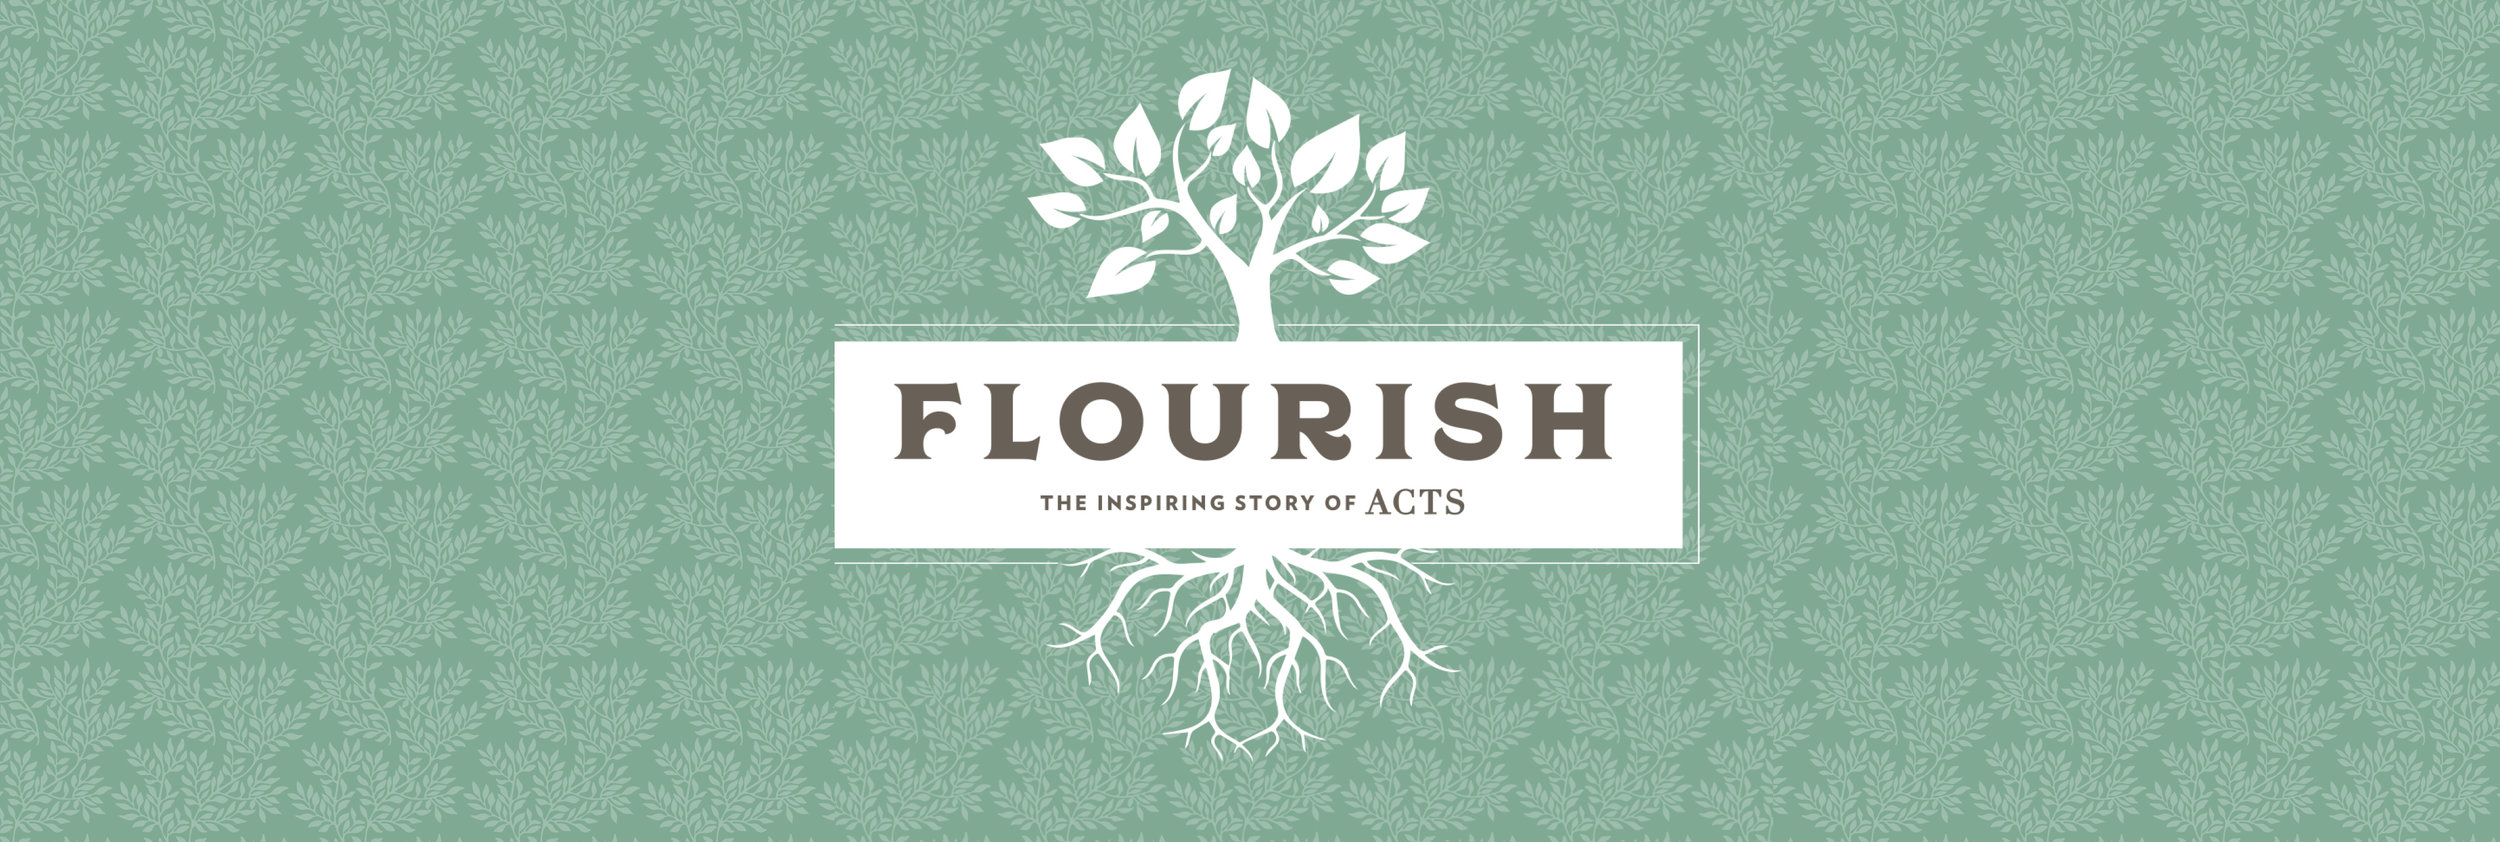 Flourish Slider.jpg